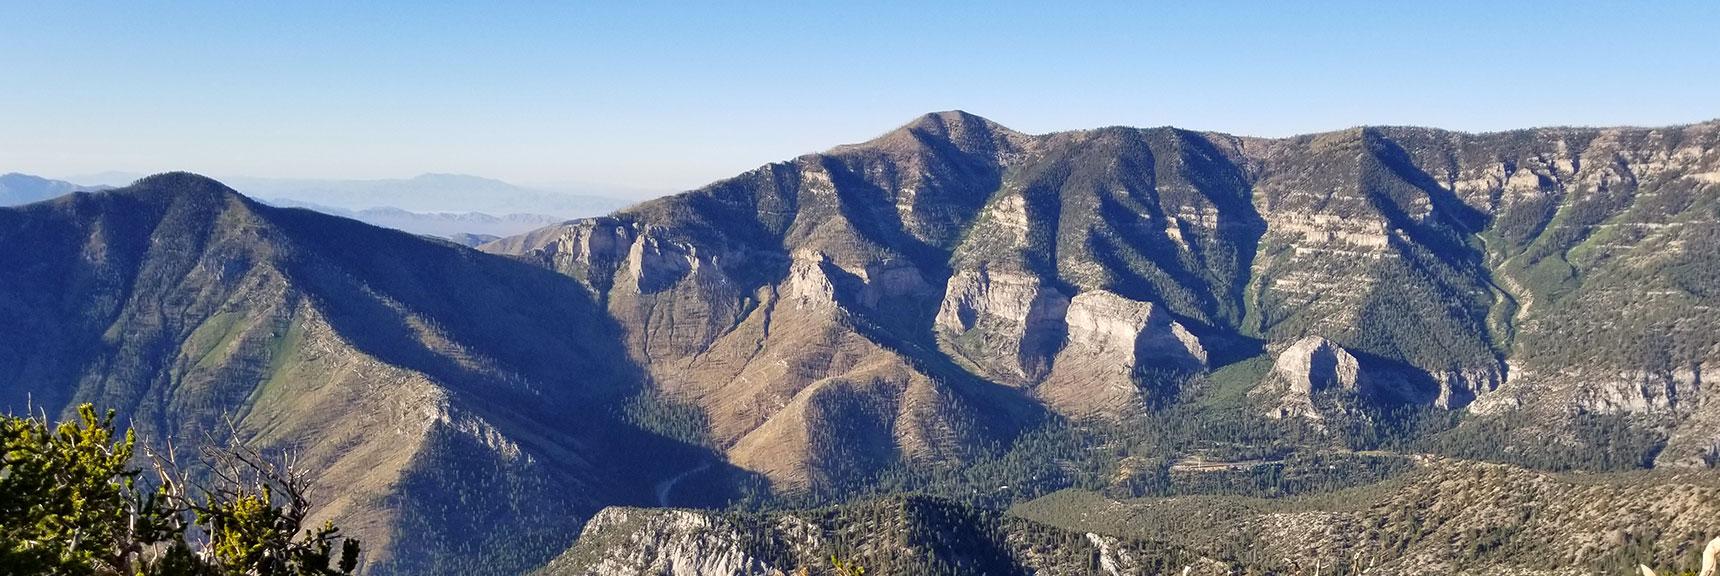 Entire Griffith Peak / Harris Mountain Circuit Viewed from Fletcher Peak Summit, Nevada